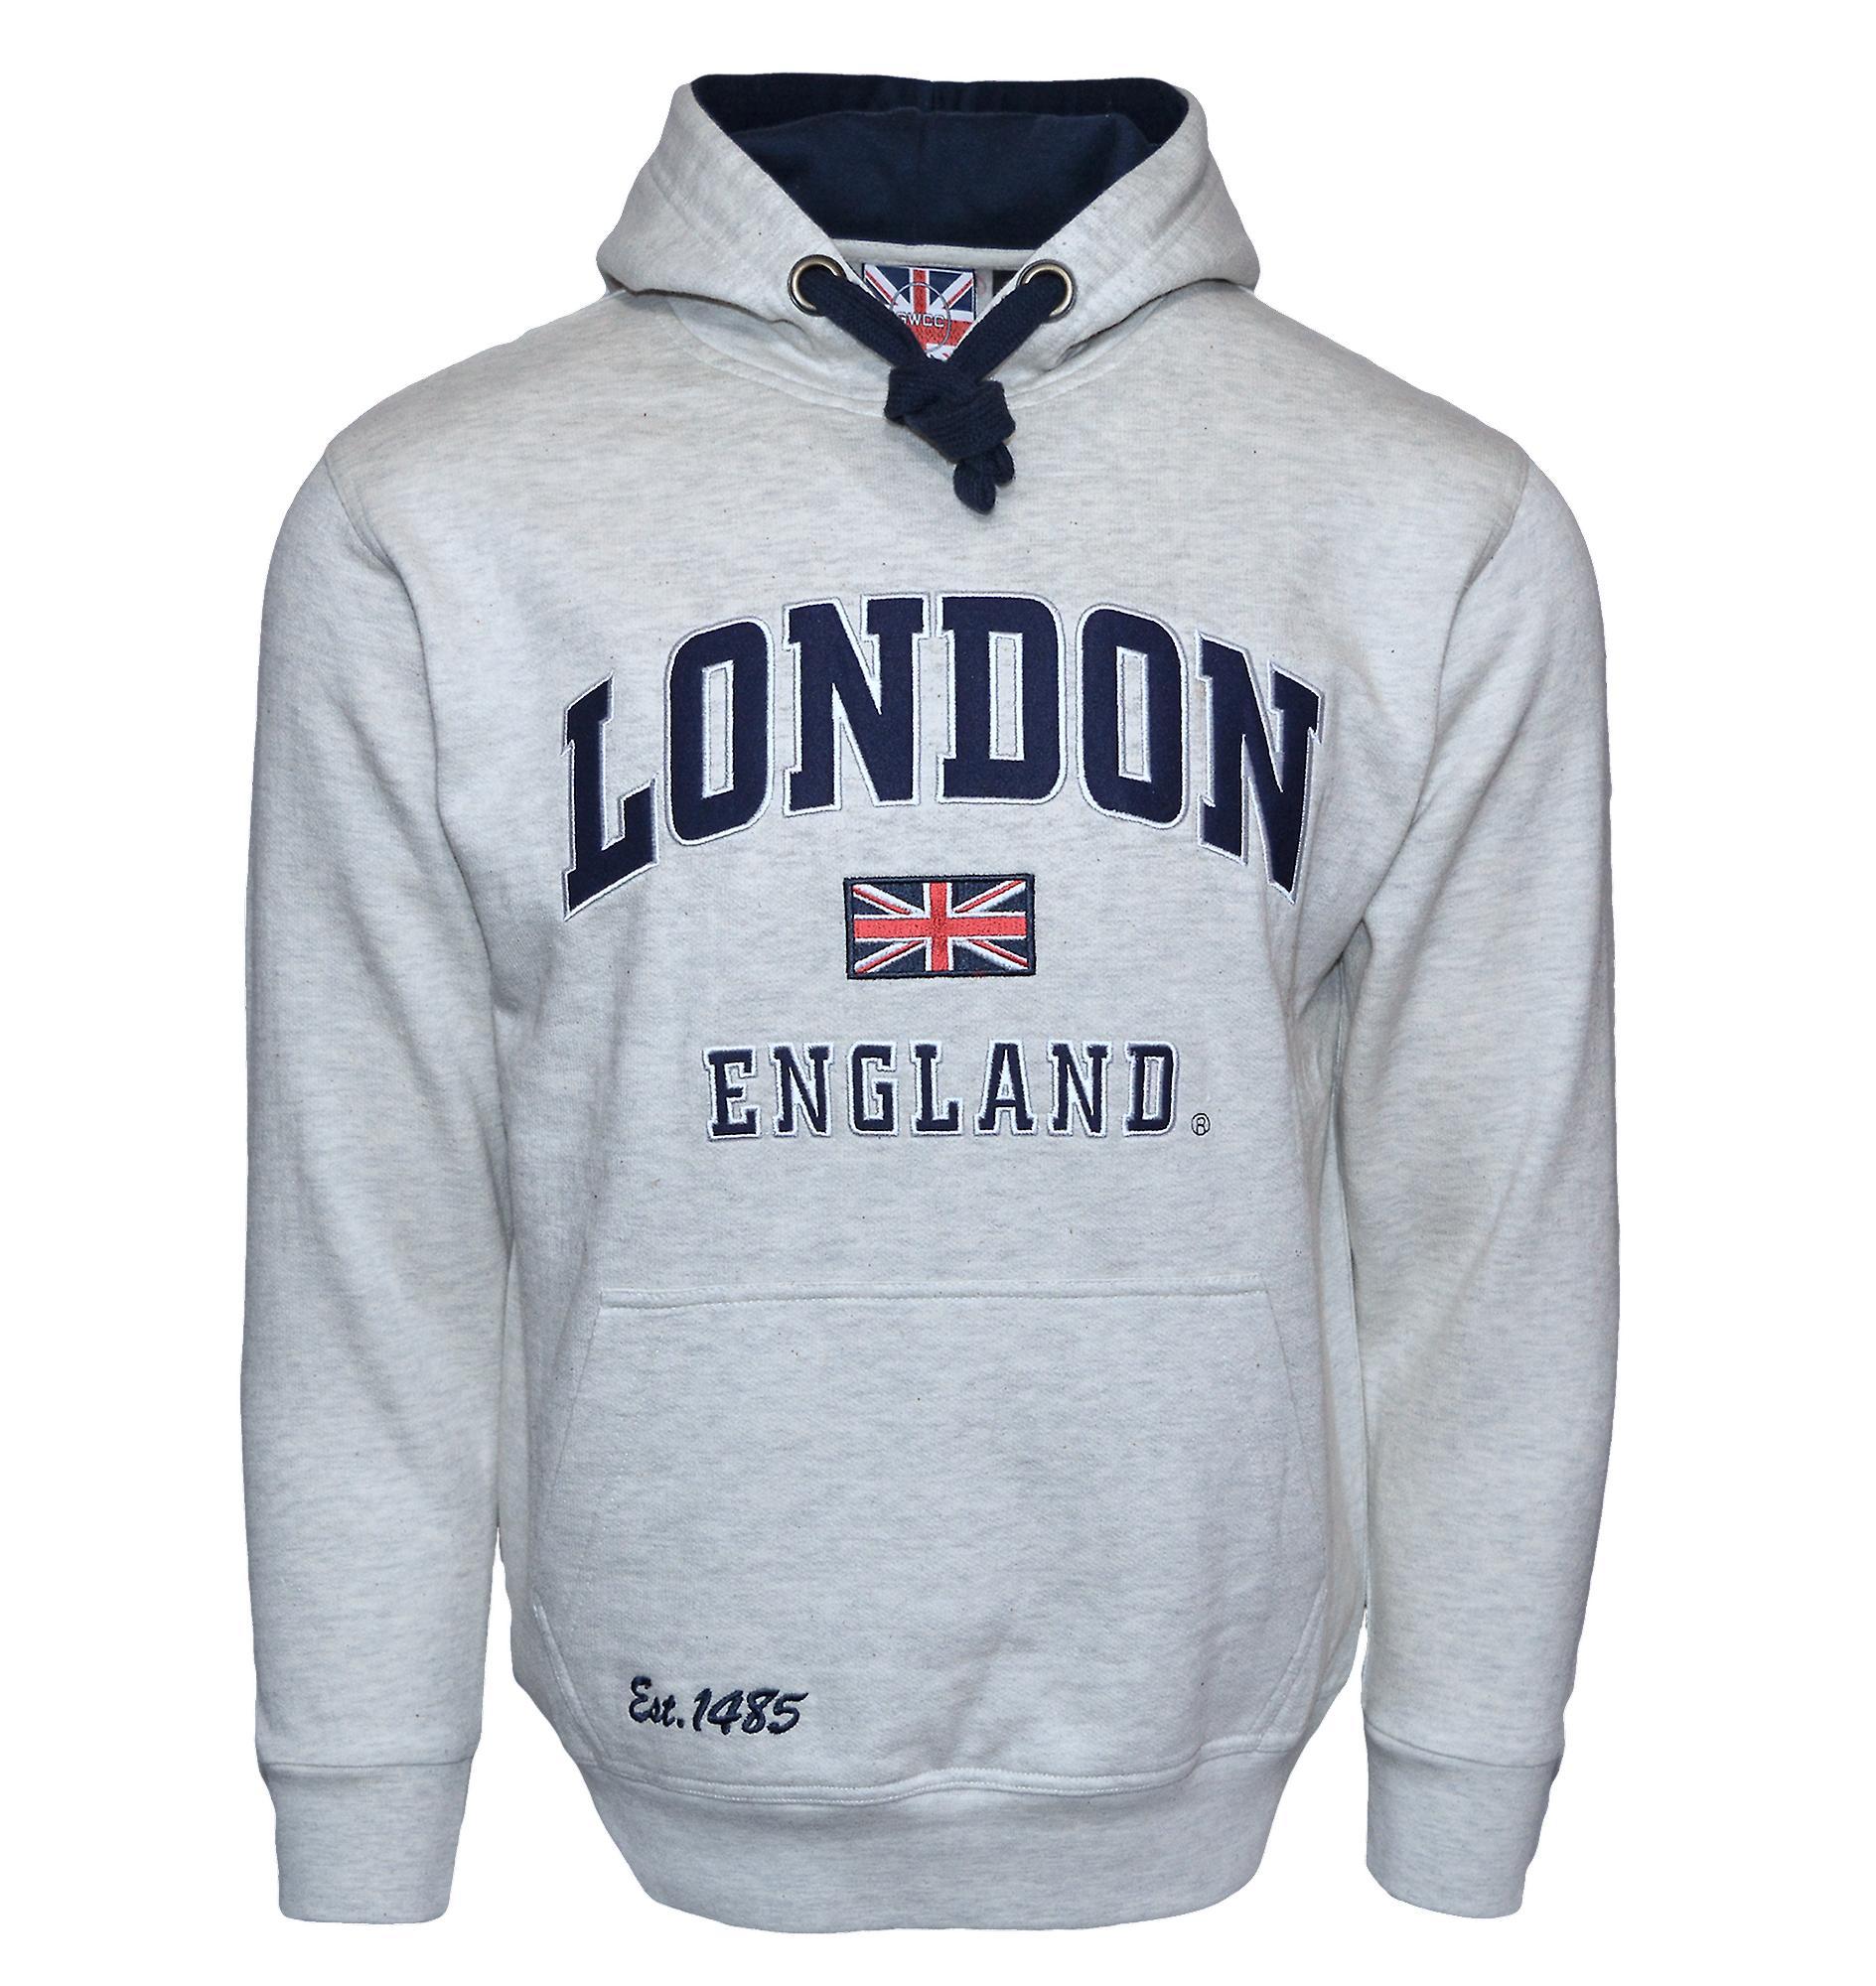 Le129gn unisex london england hoodie hooded sweatshirt grey navy xs-2xl